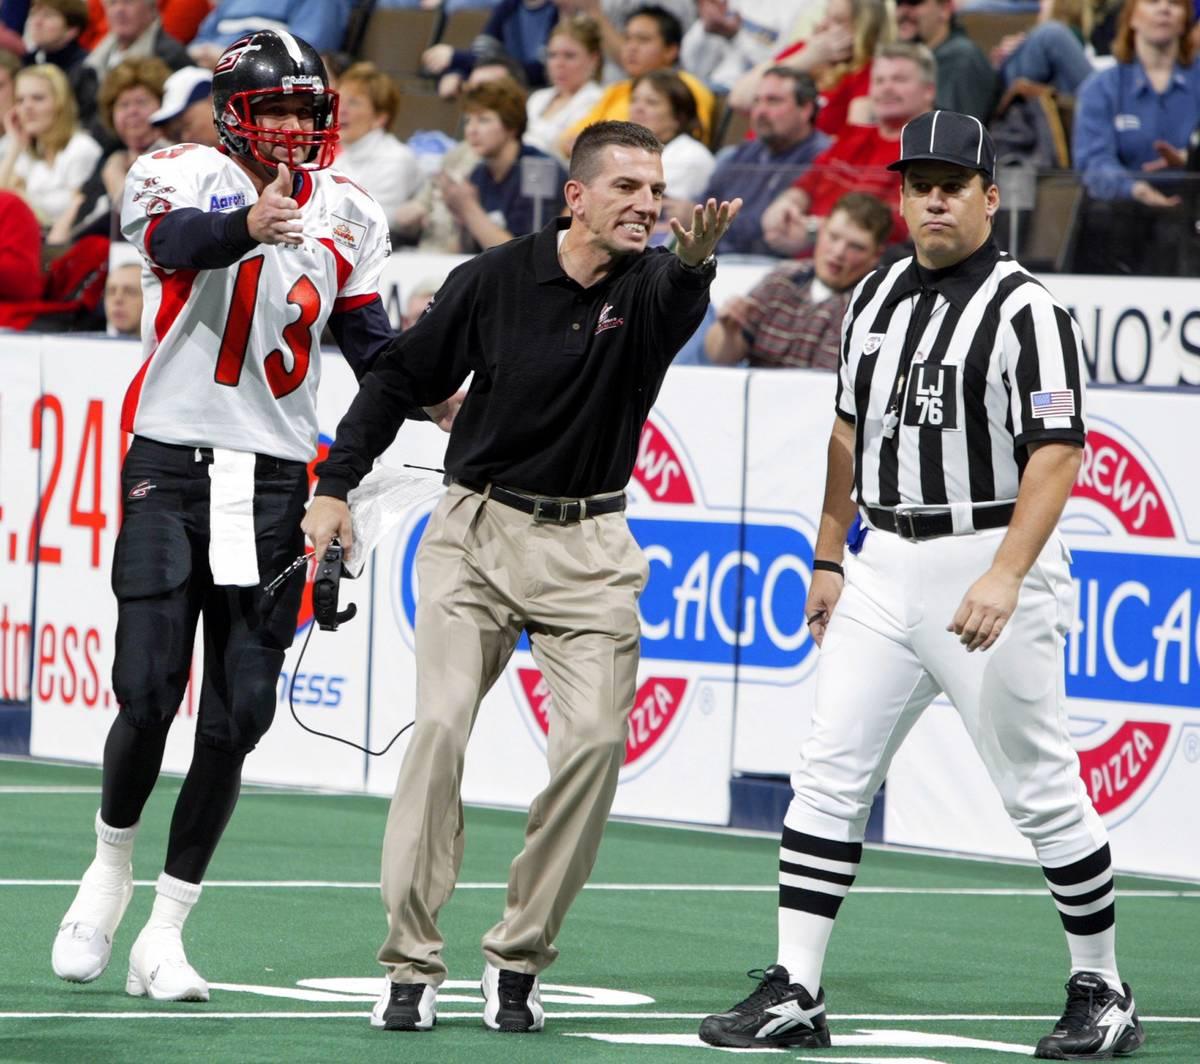 SPECIAL FOR THE LAS VEGAS REVIEW JOURNAL- Las Vegas Gladiators head coach Frank Haege and quart ...